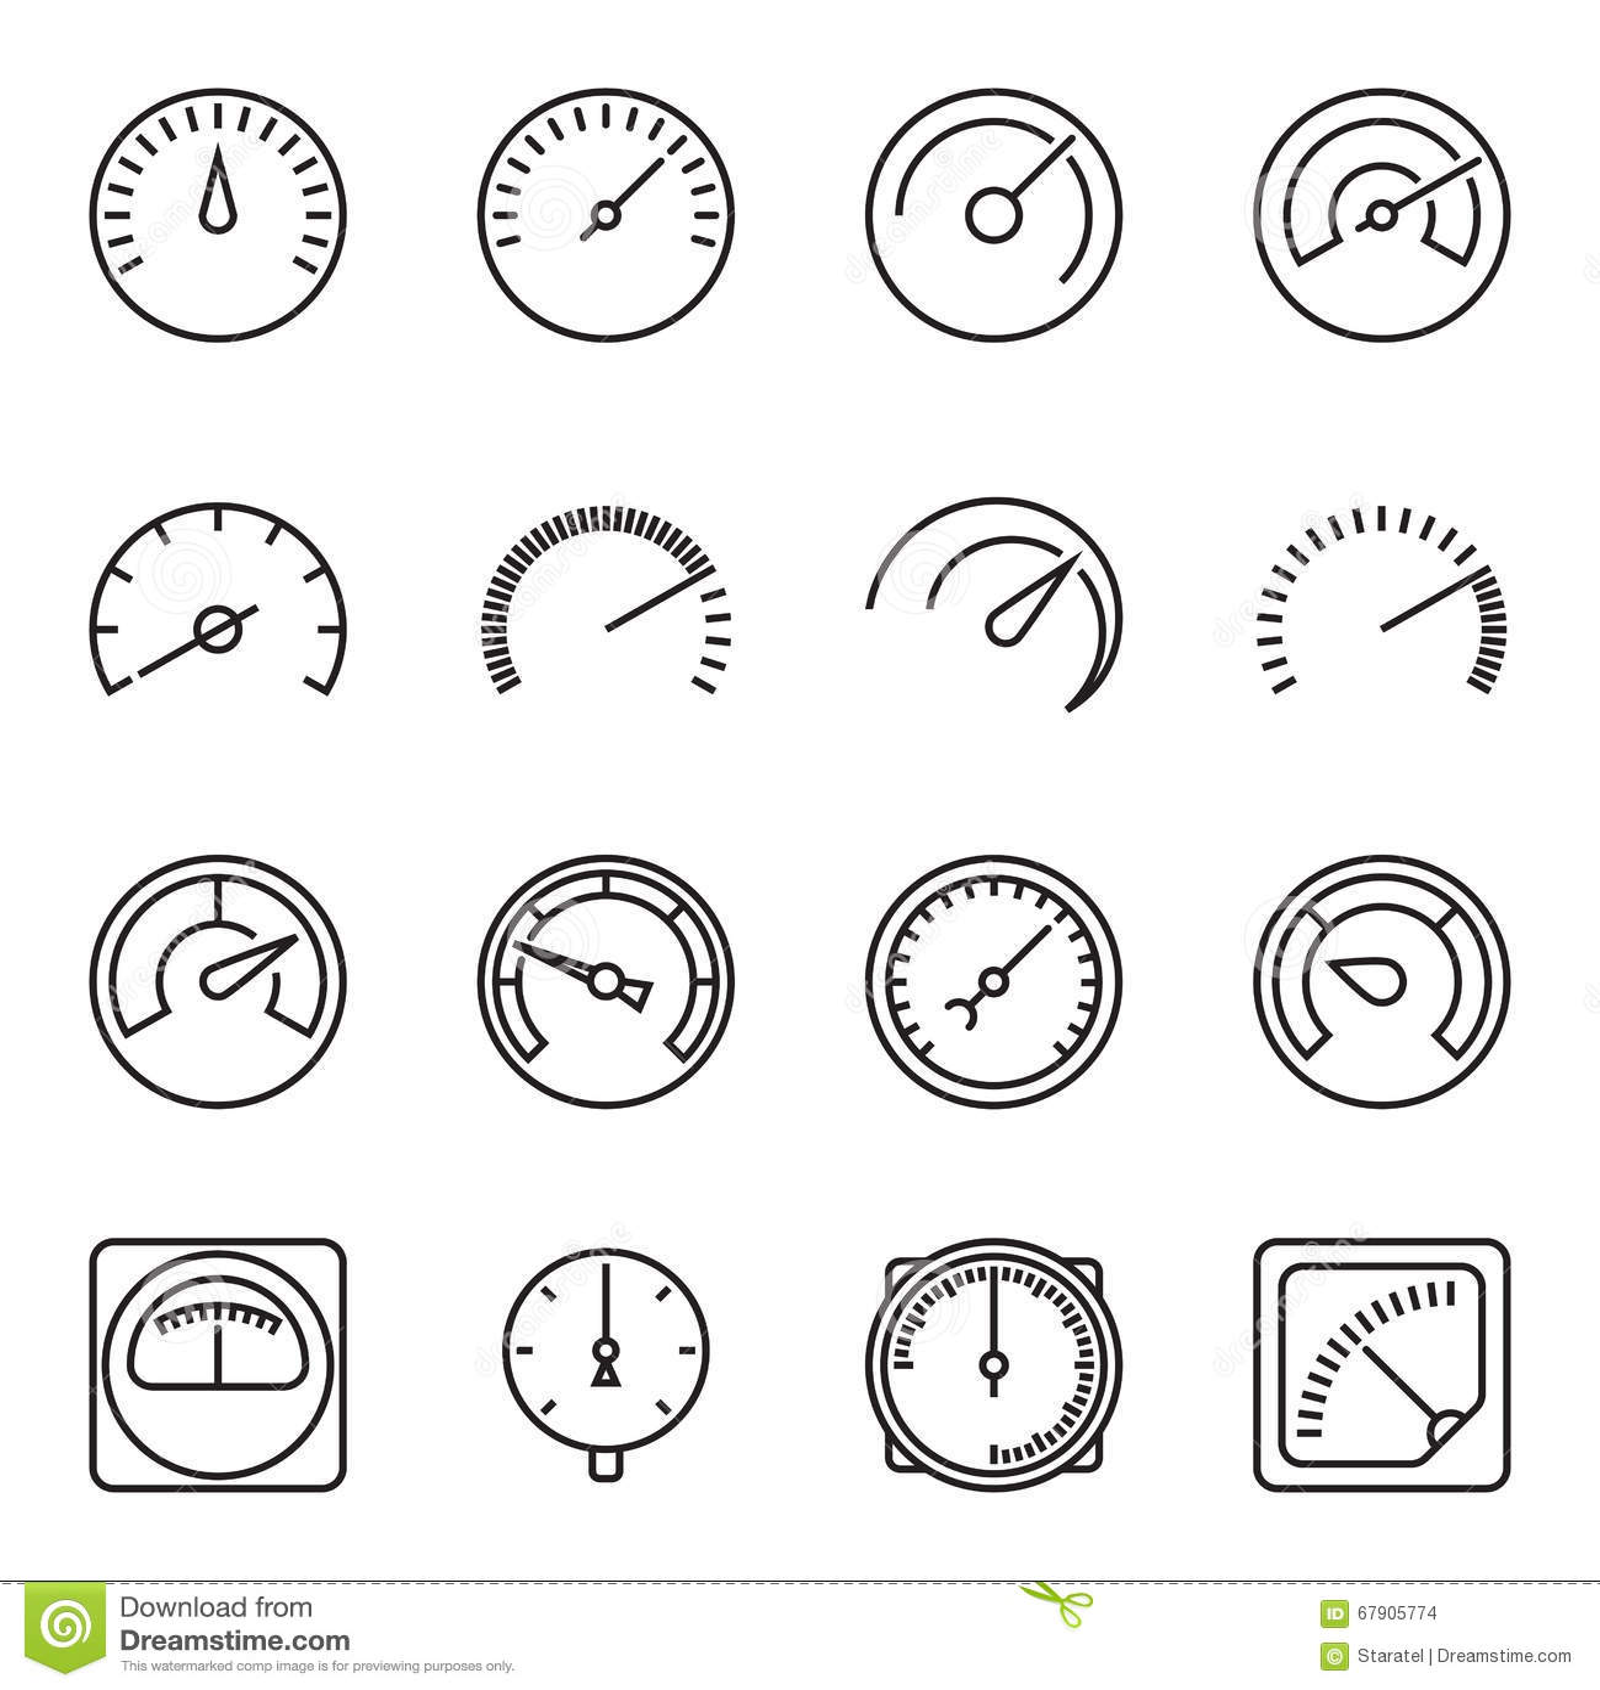 how to read edmi atlas meter